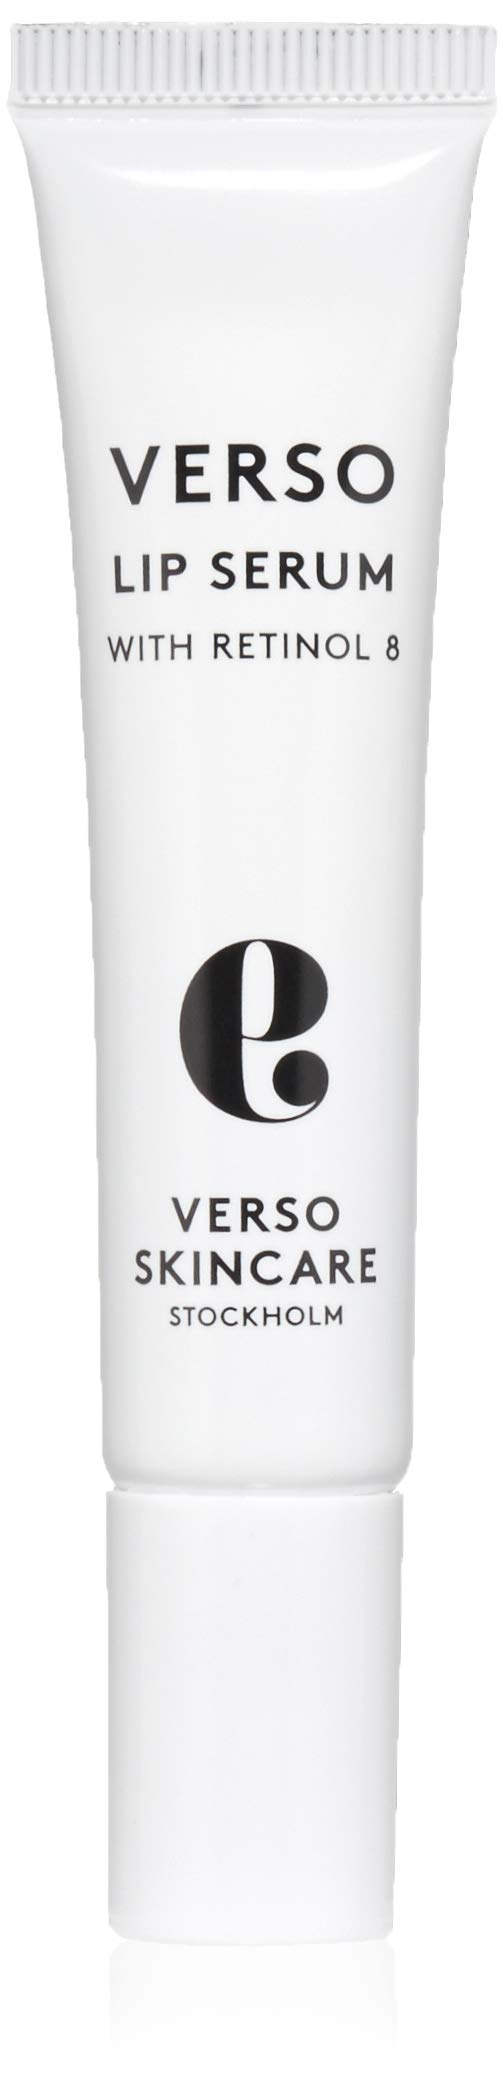 Verso Skincare Lip Serum for Women, 0.5 Ounce by Verso Skincare